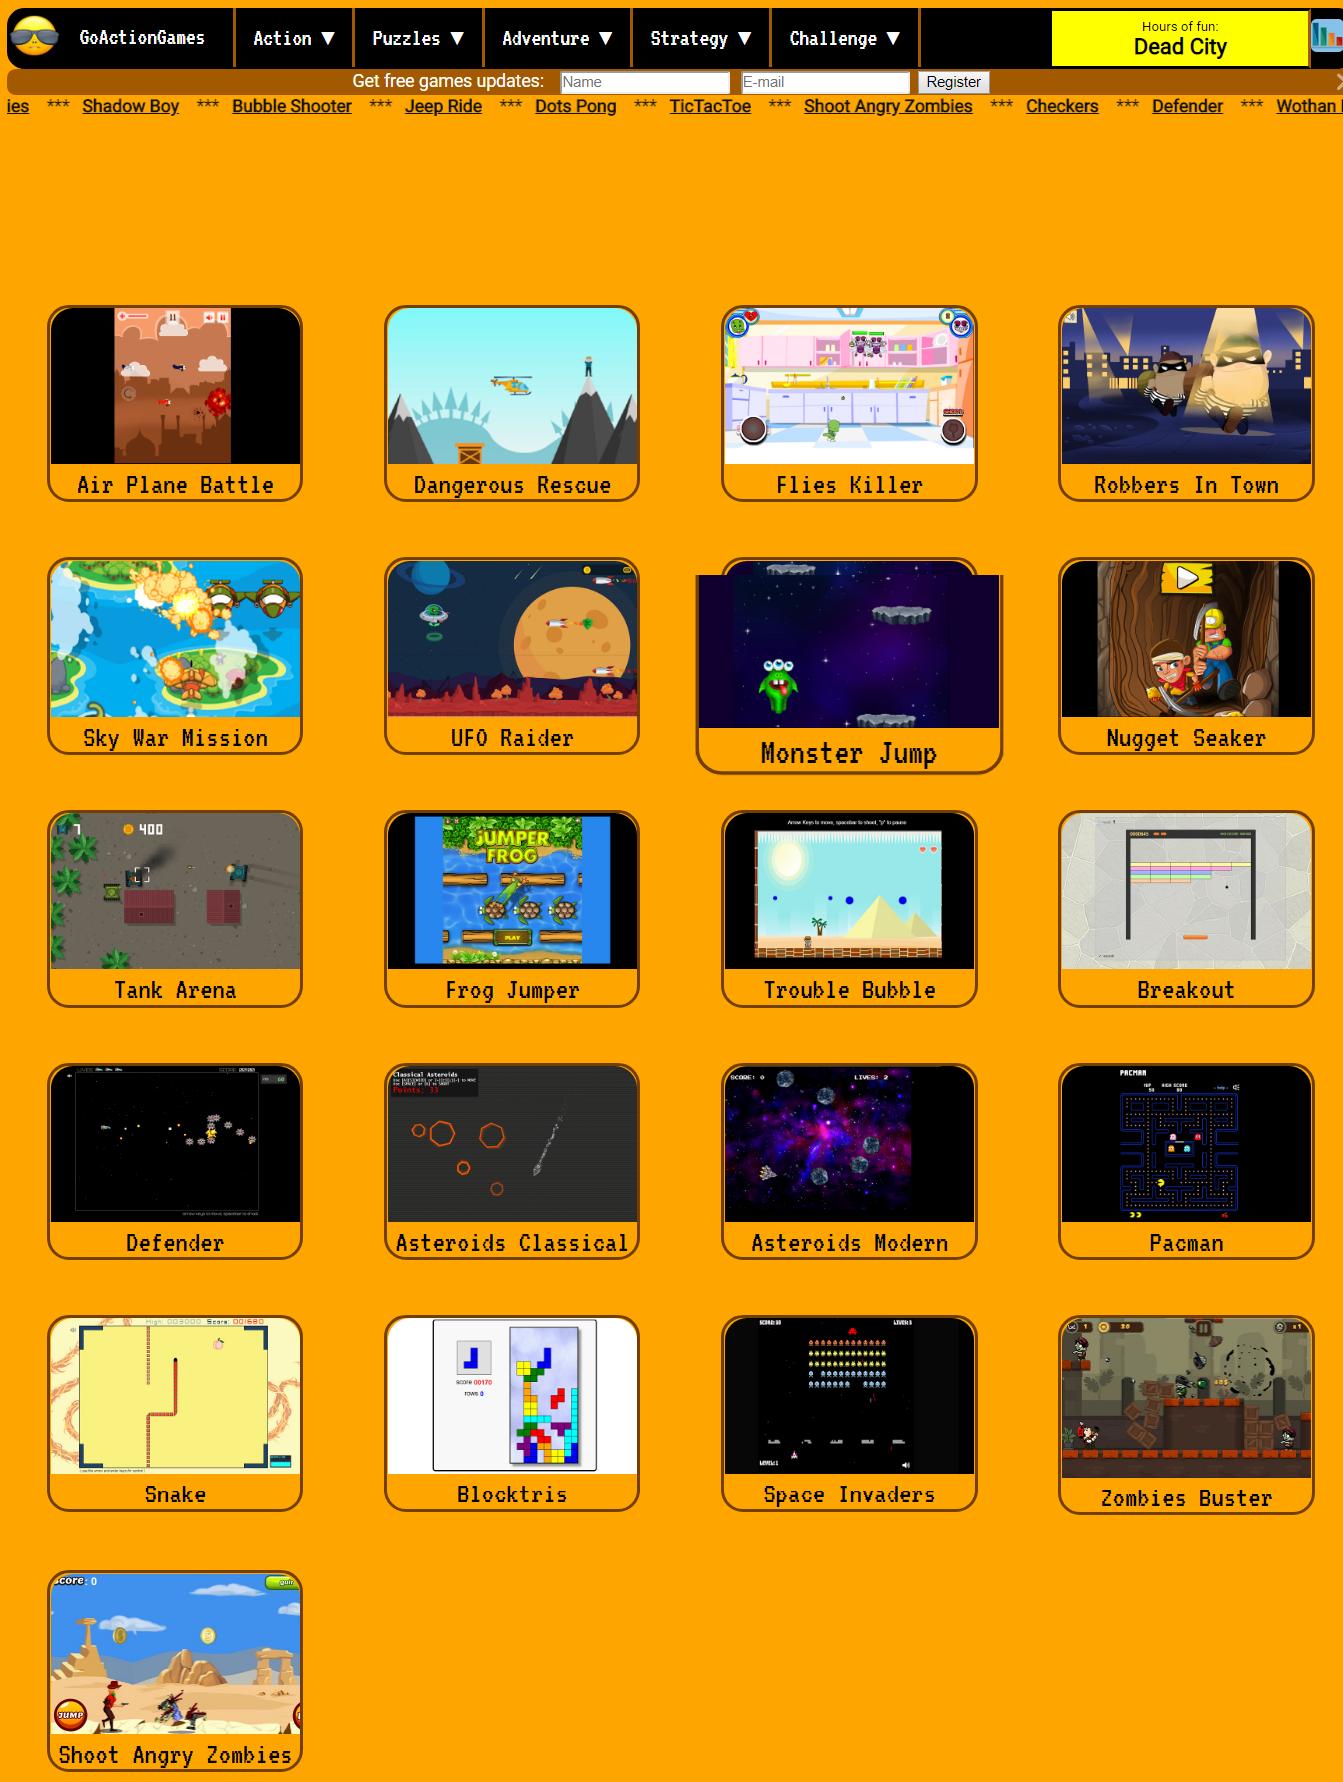 Exolon Game - play online | Games Captain